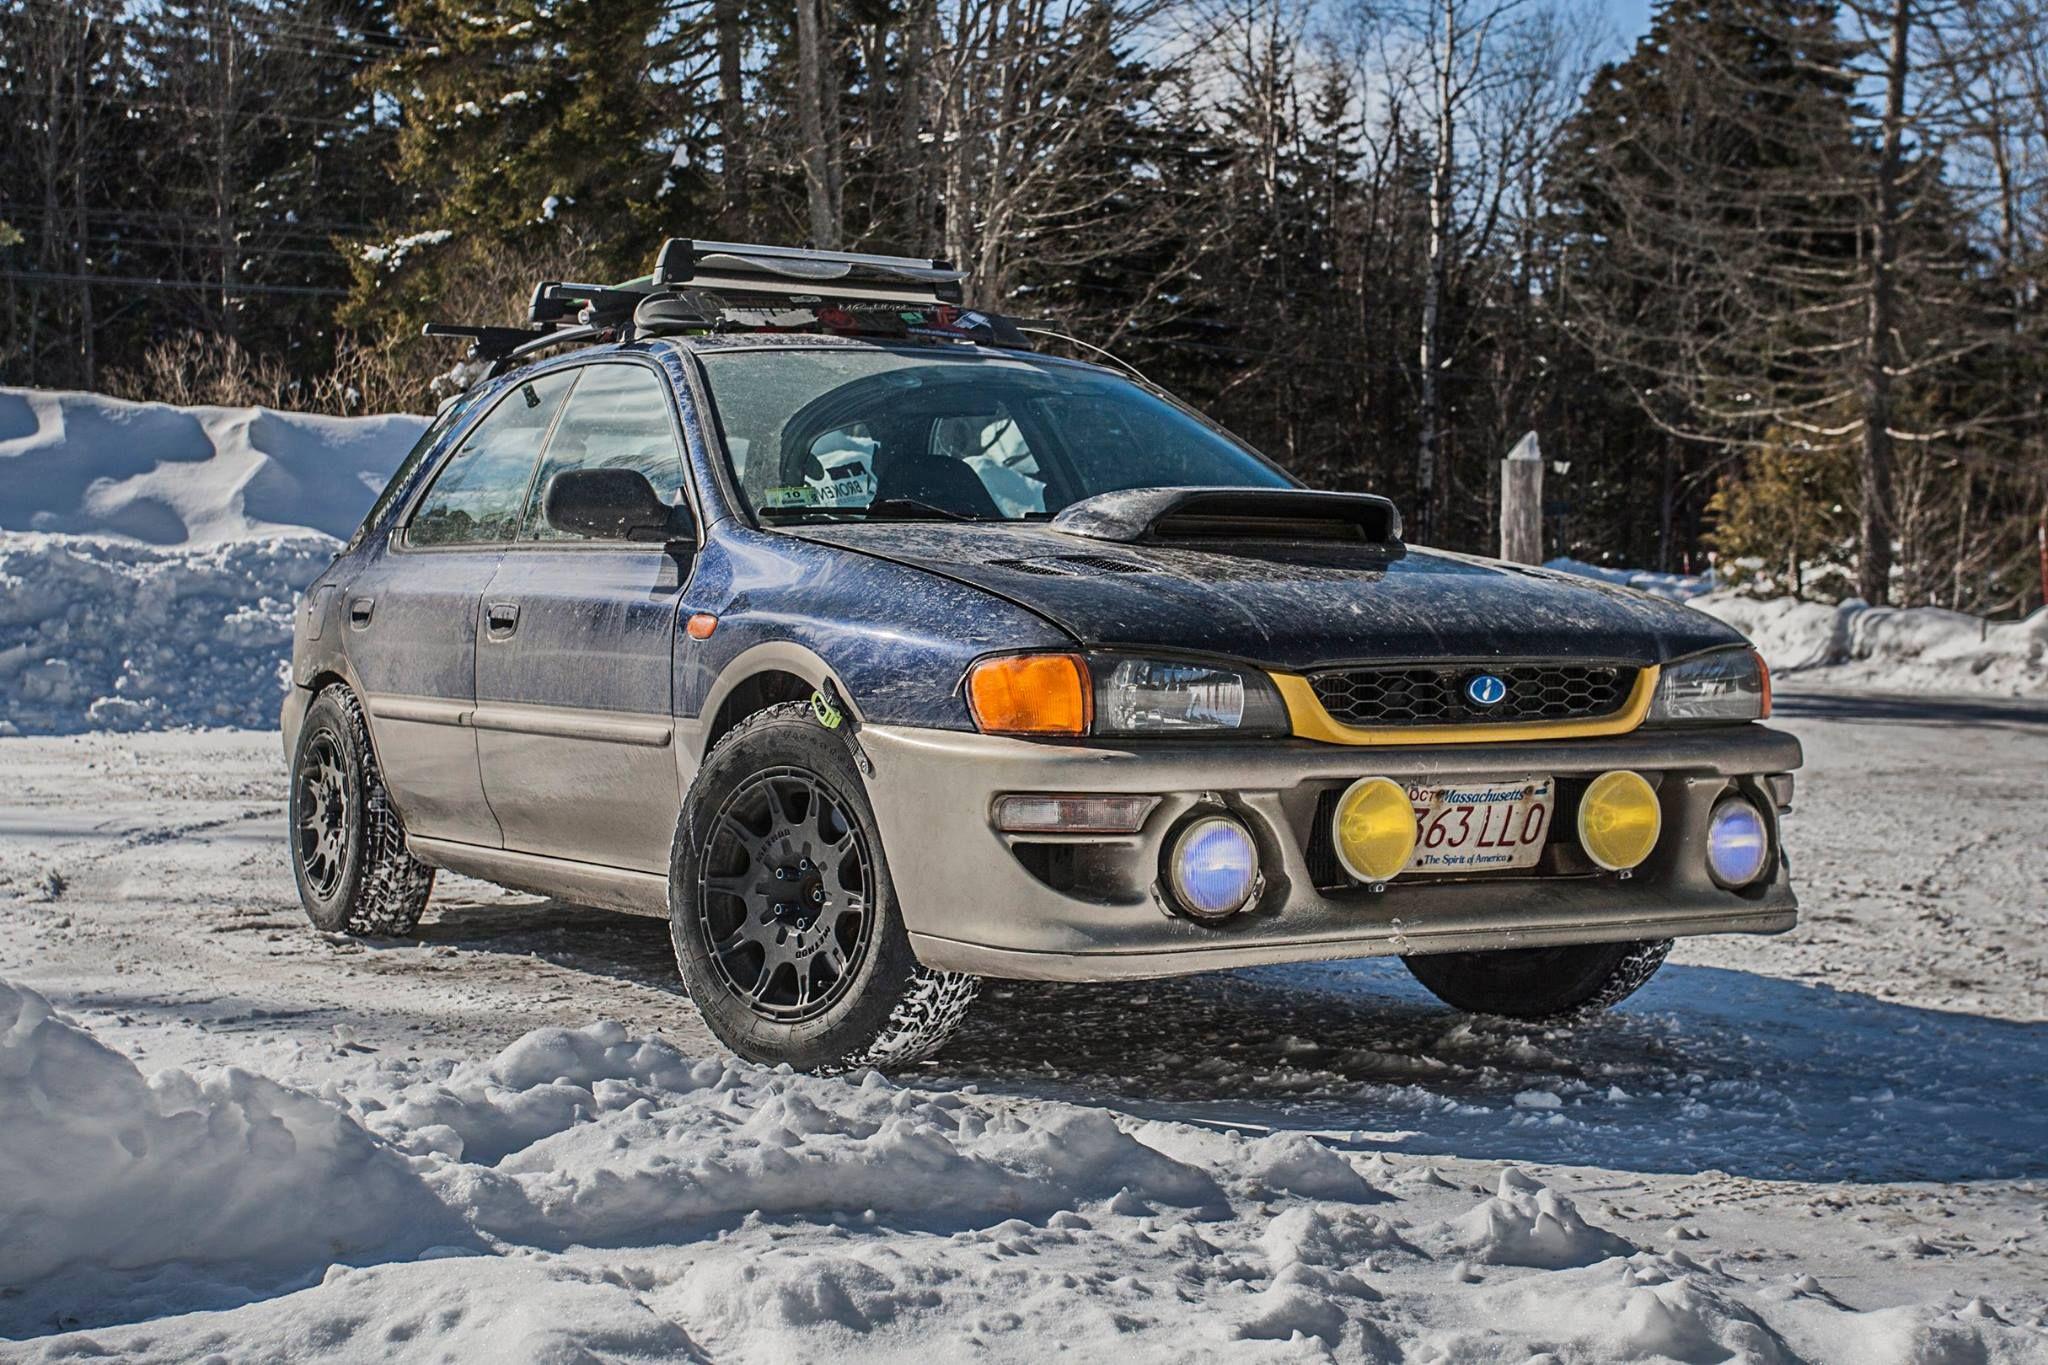 Show Your Wagon Page 968 Subaru Impreza Gc8 Rs Forum Community Impreza Subaru Impreza Wrx